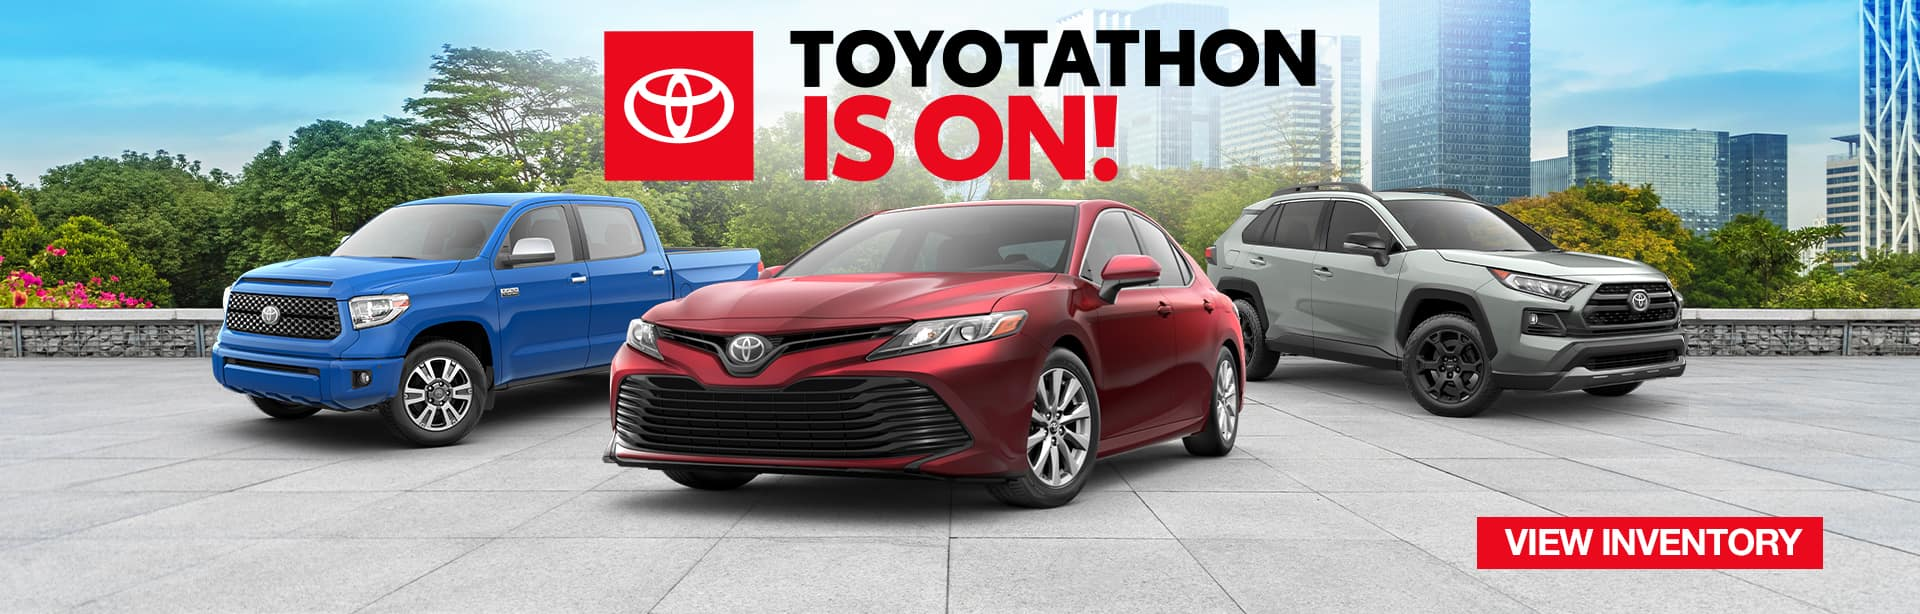 Toyota National Slider | Toyotathon Is On!